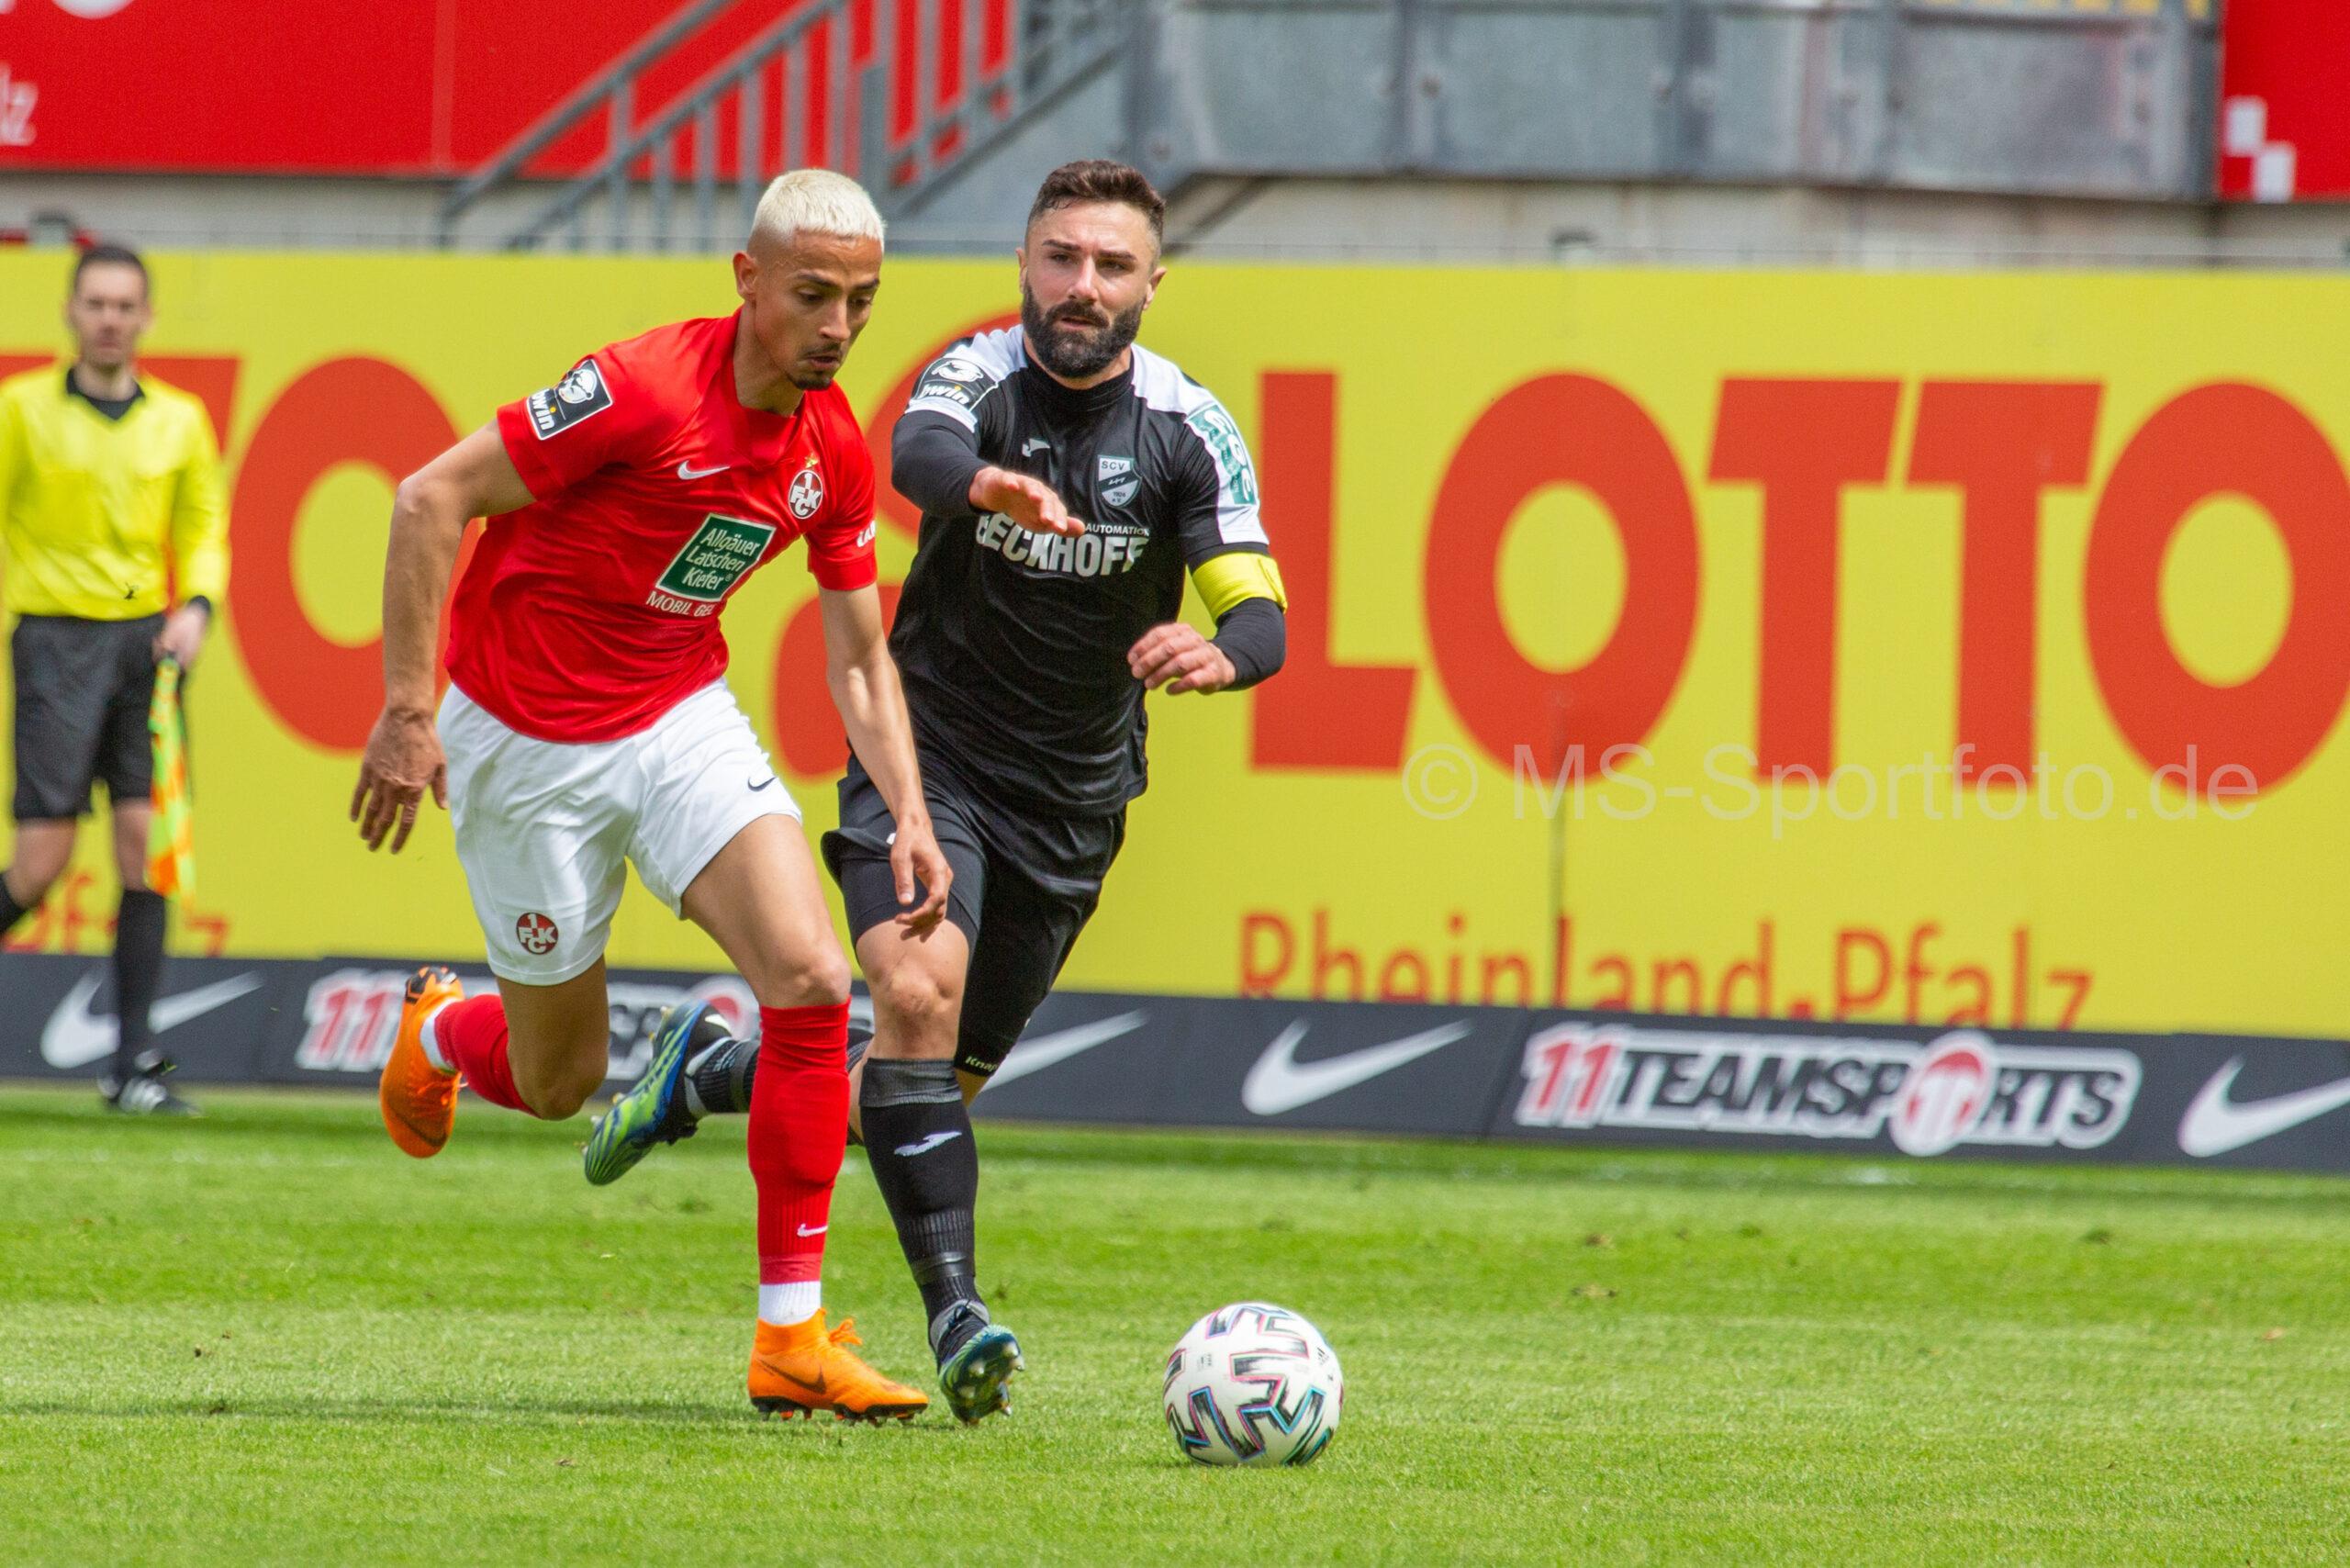 LOTTO Rheinland-Pfalz verlängert Partnerschaft mit dem 1. FC Kaiserslautern